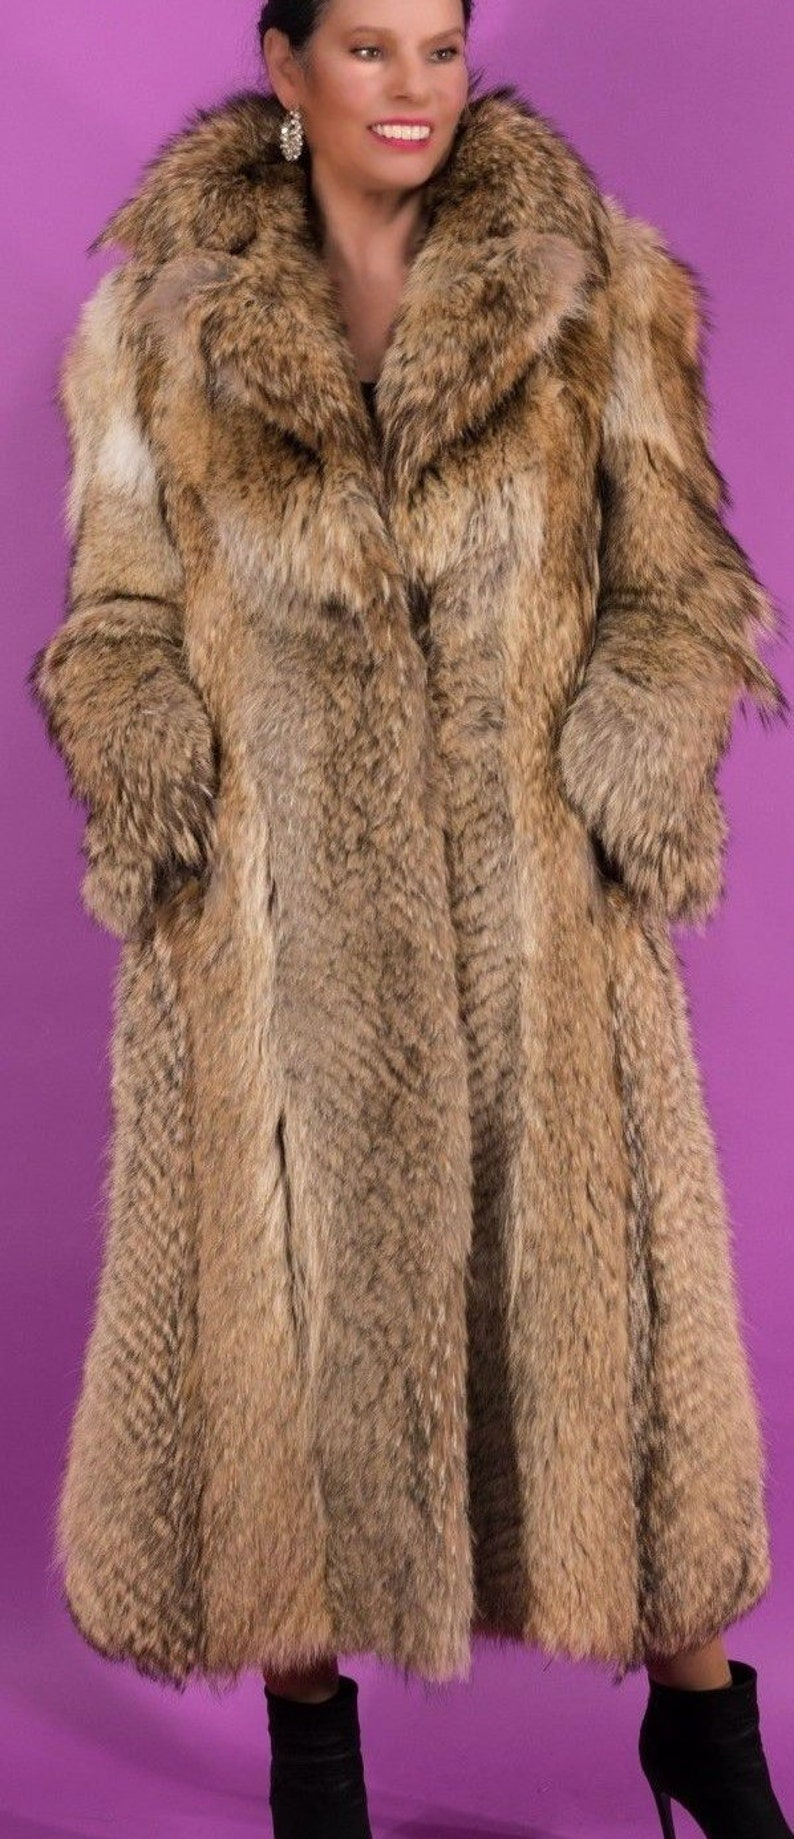 Coyote Fur Coat >> Coyote Fur Coat Full Length Size Small